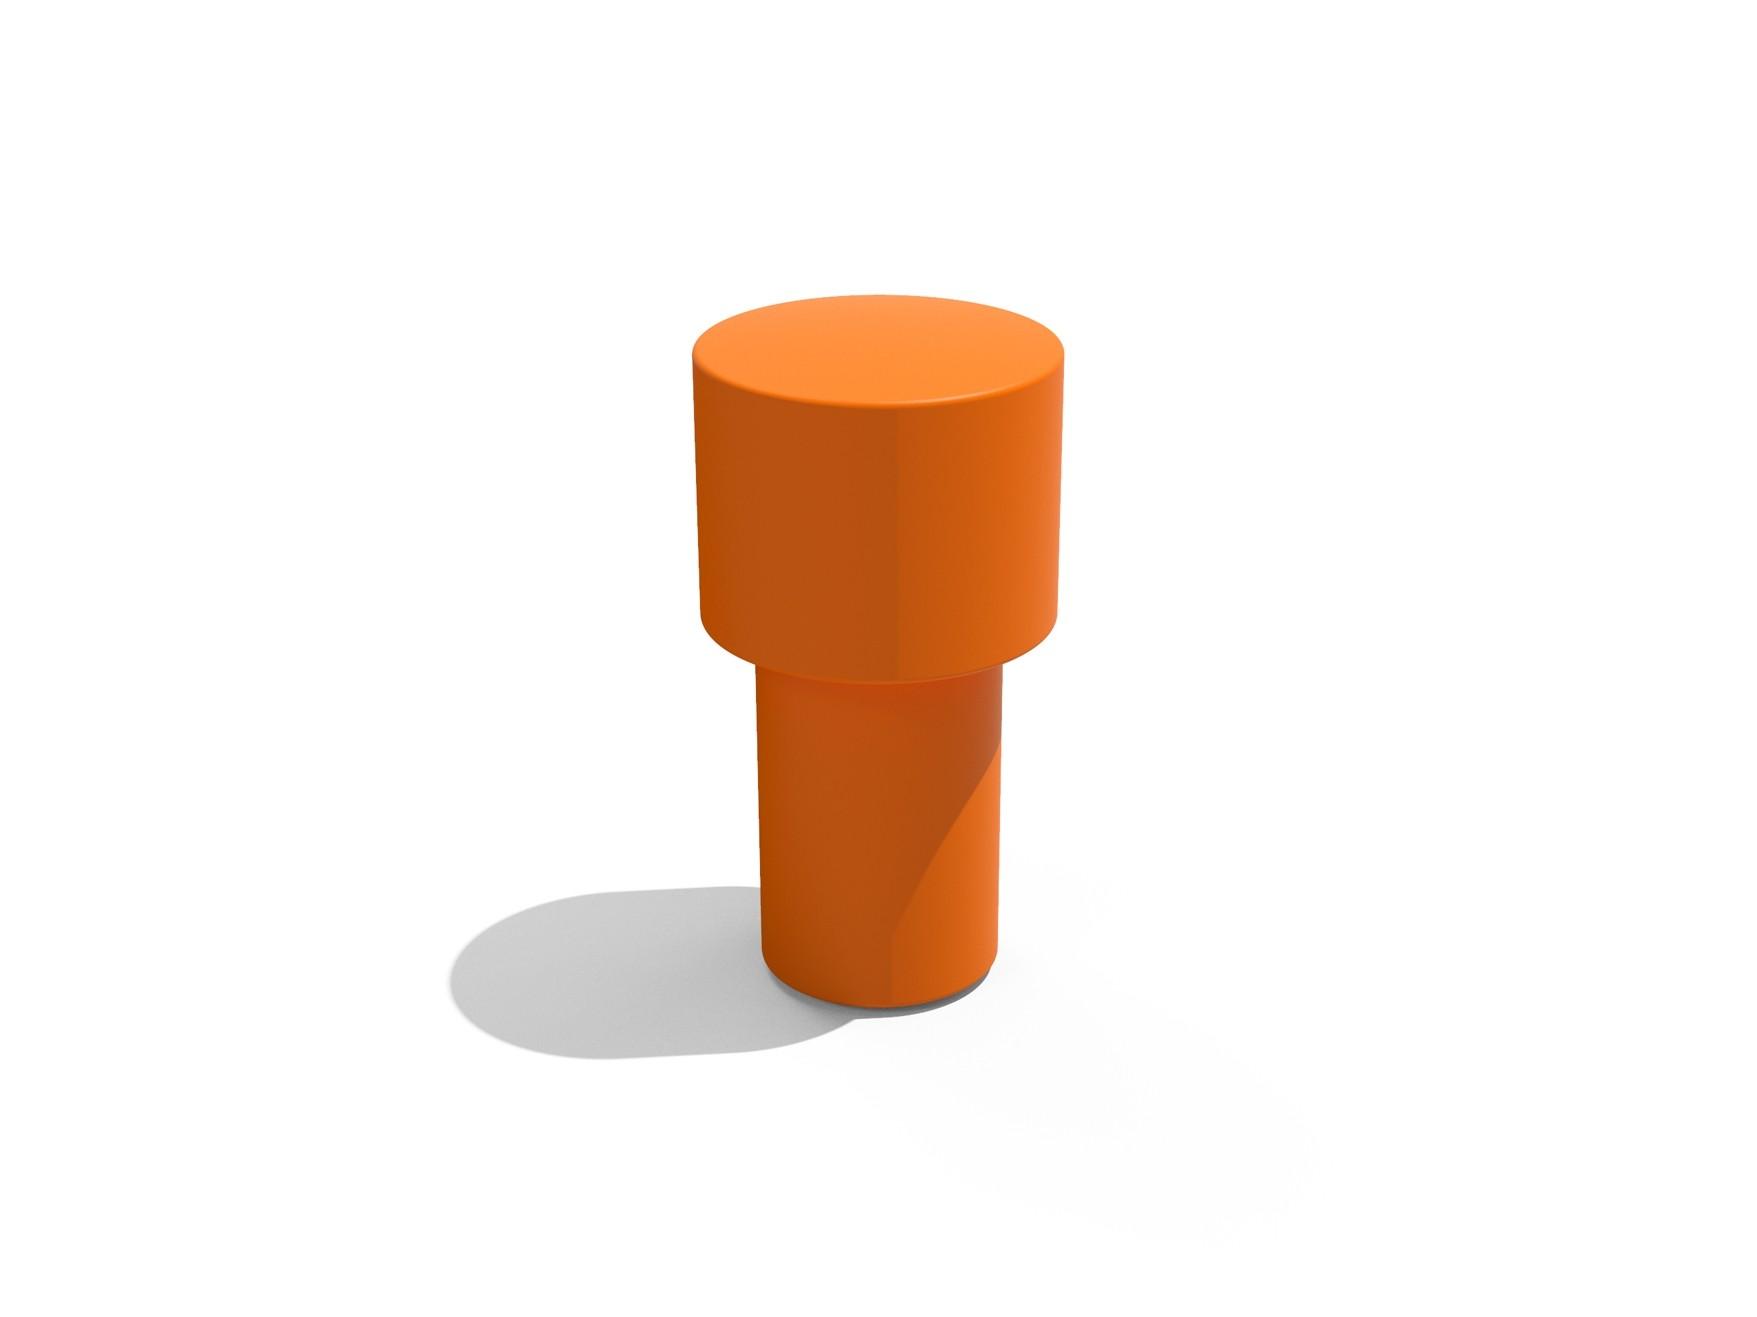 HopOp Kruk Oranje